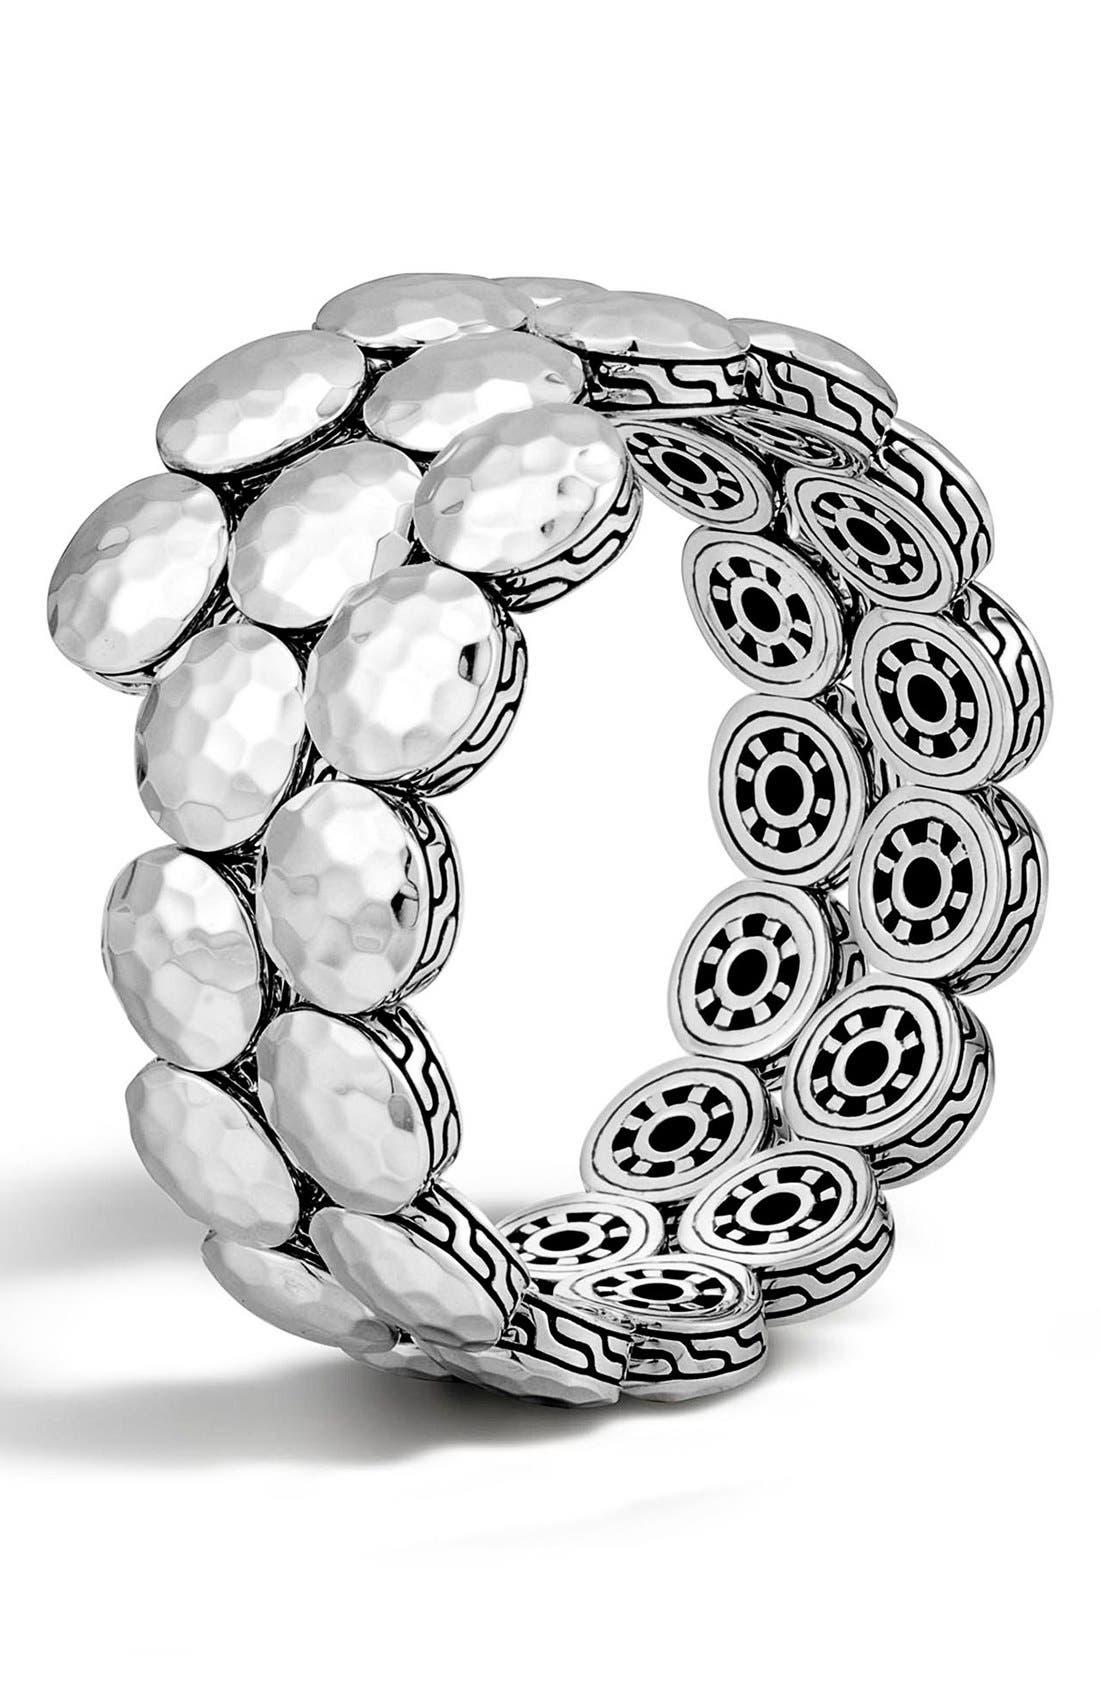 Main Image - John Hardy 'Dot' Disc Double Coil Bracelet